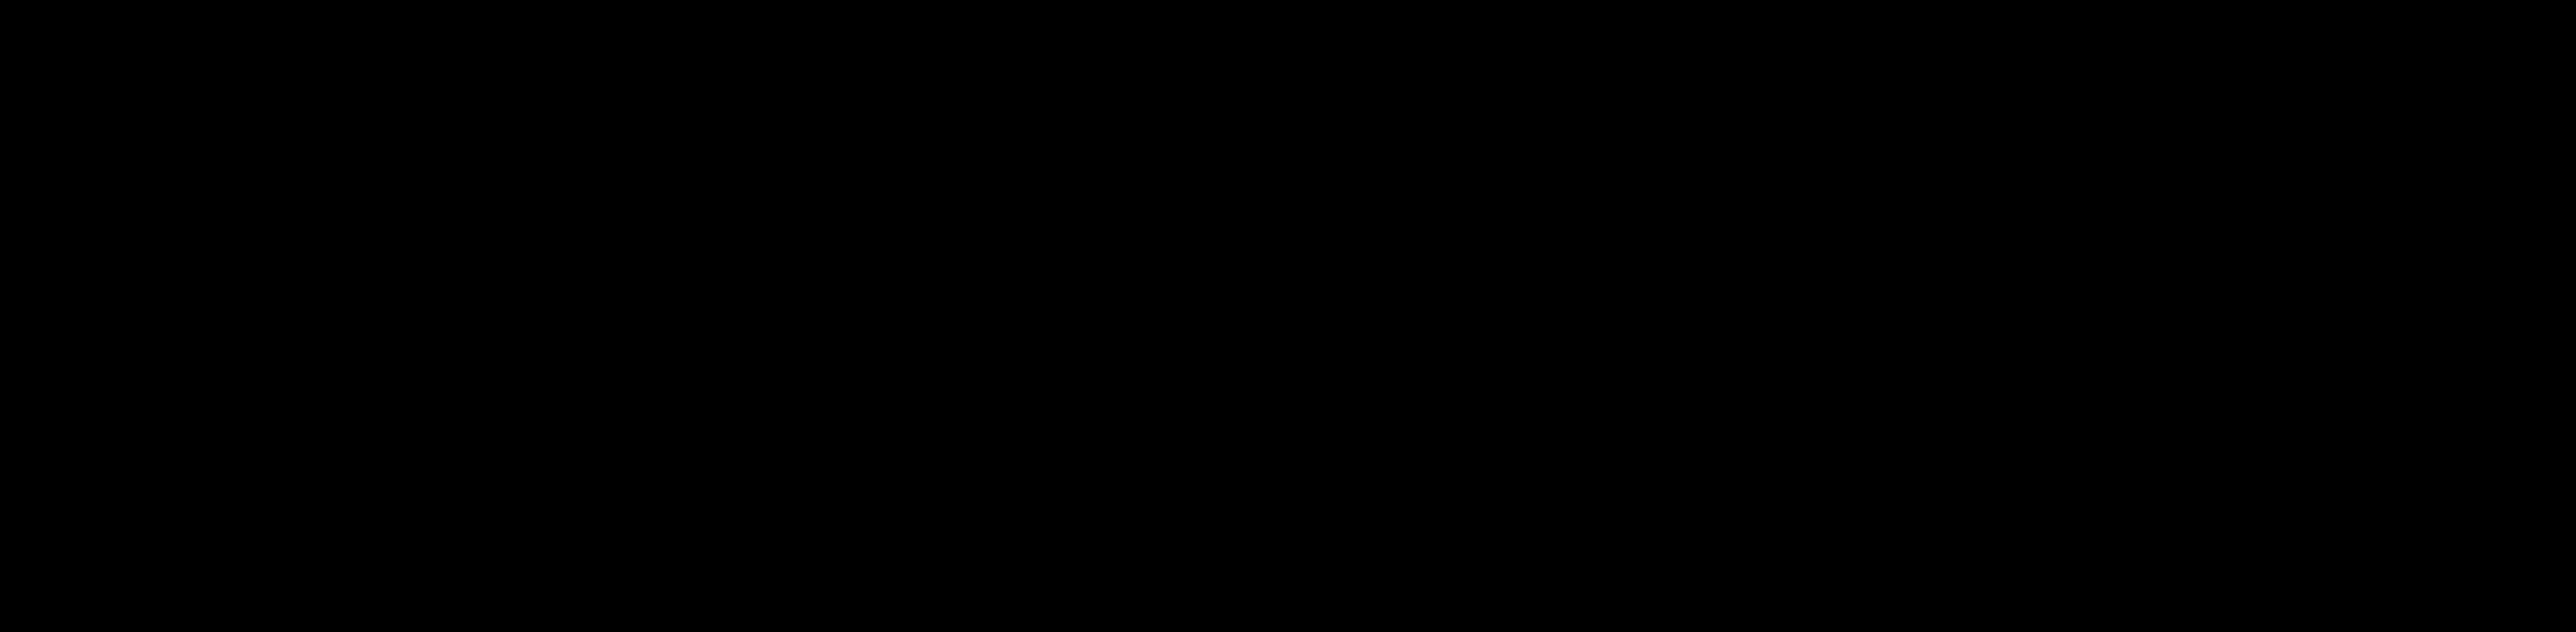 SKYTREK-1